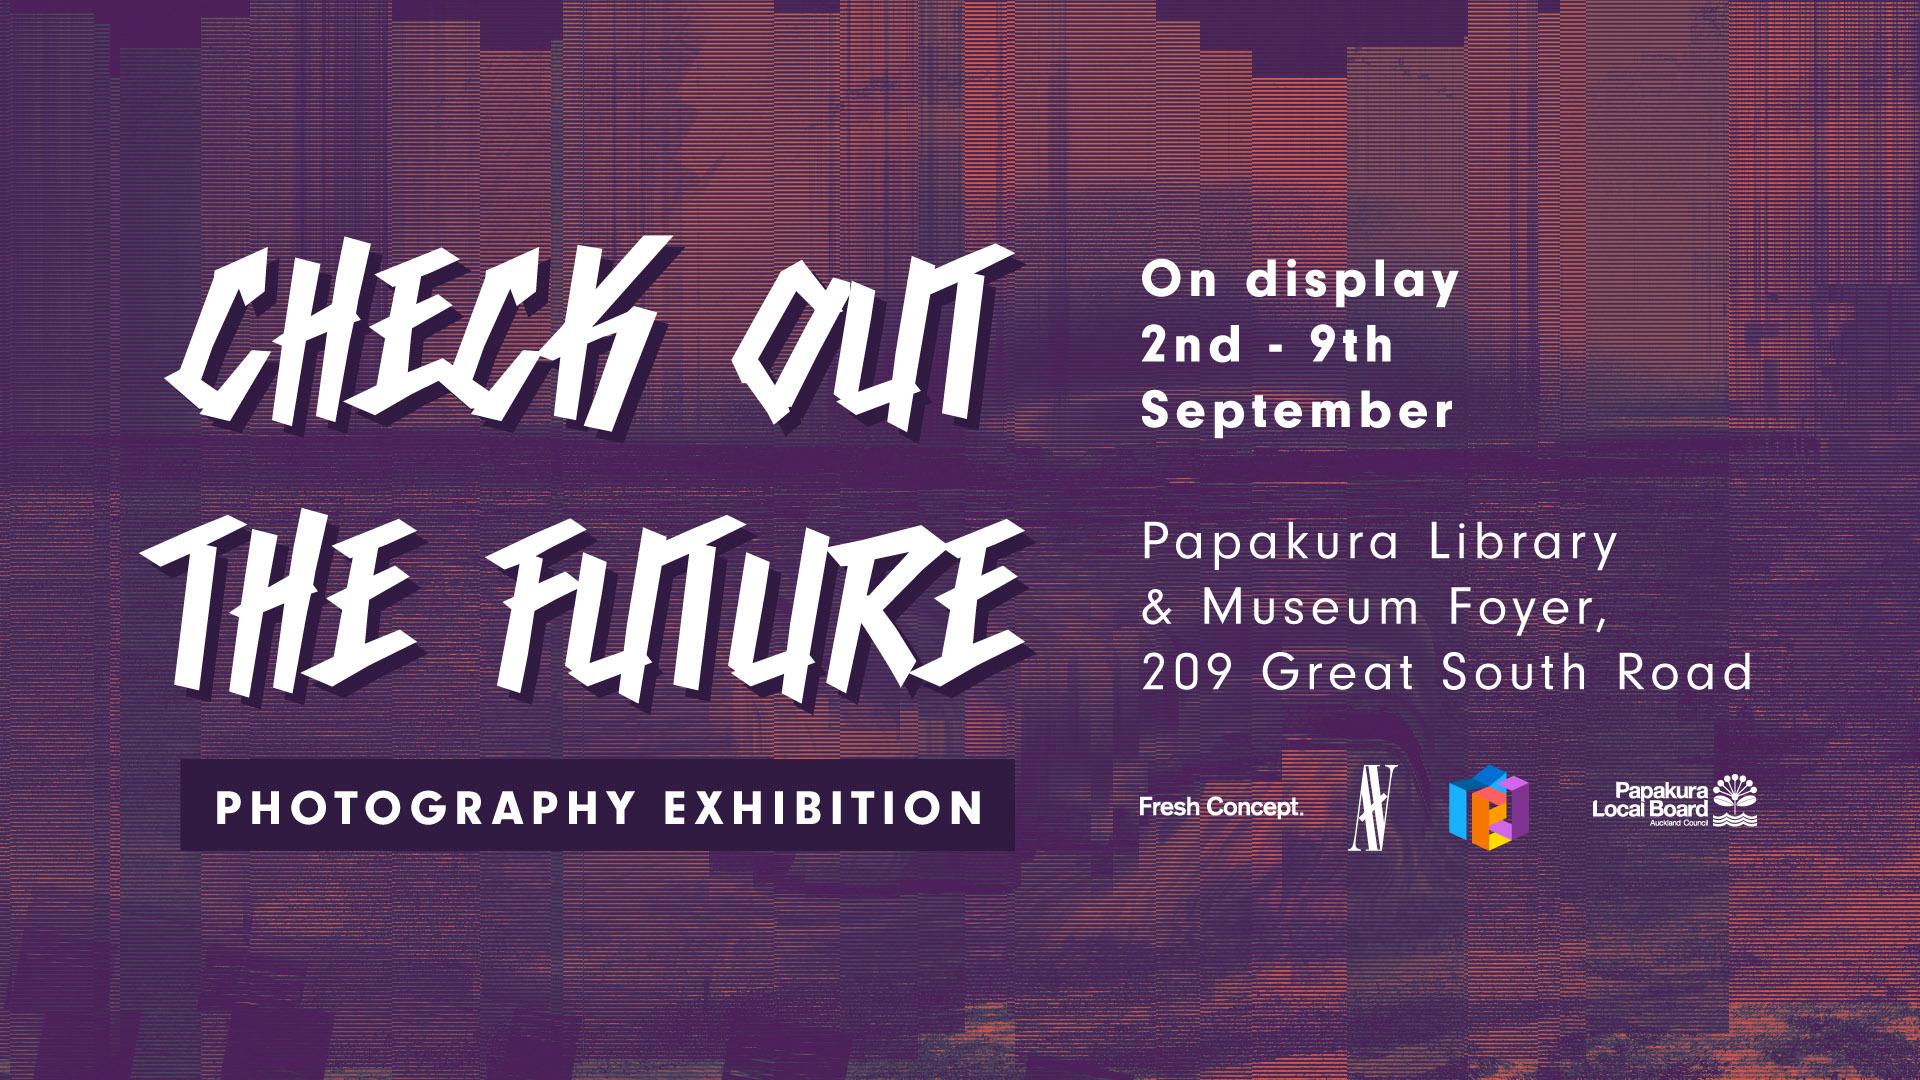 Check+Out+the+Future_ExhibitionArtboard+1.jpg